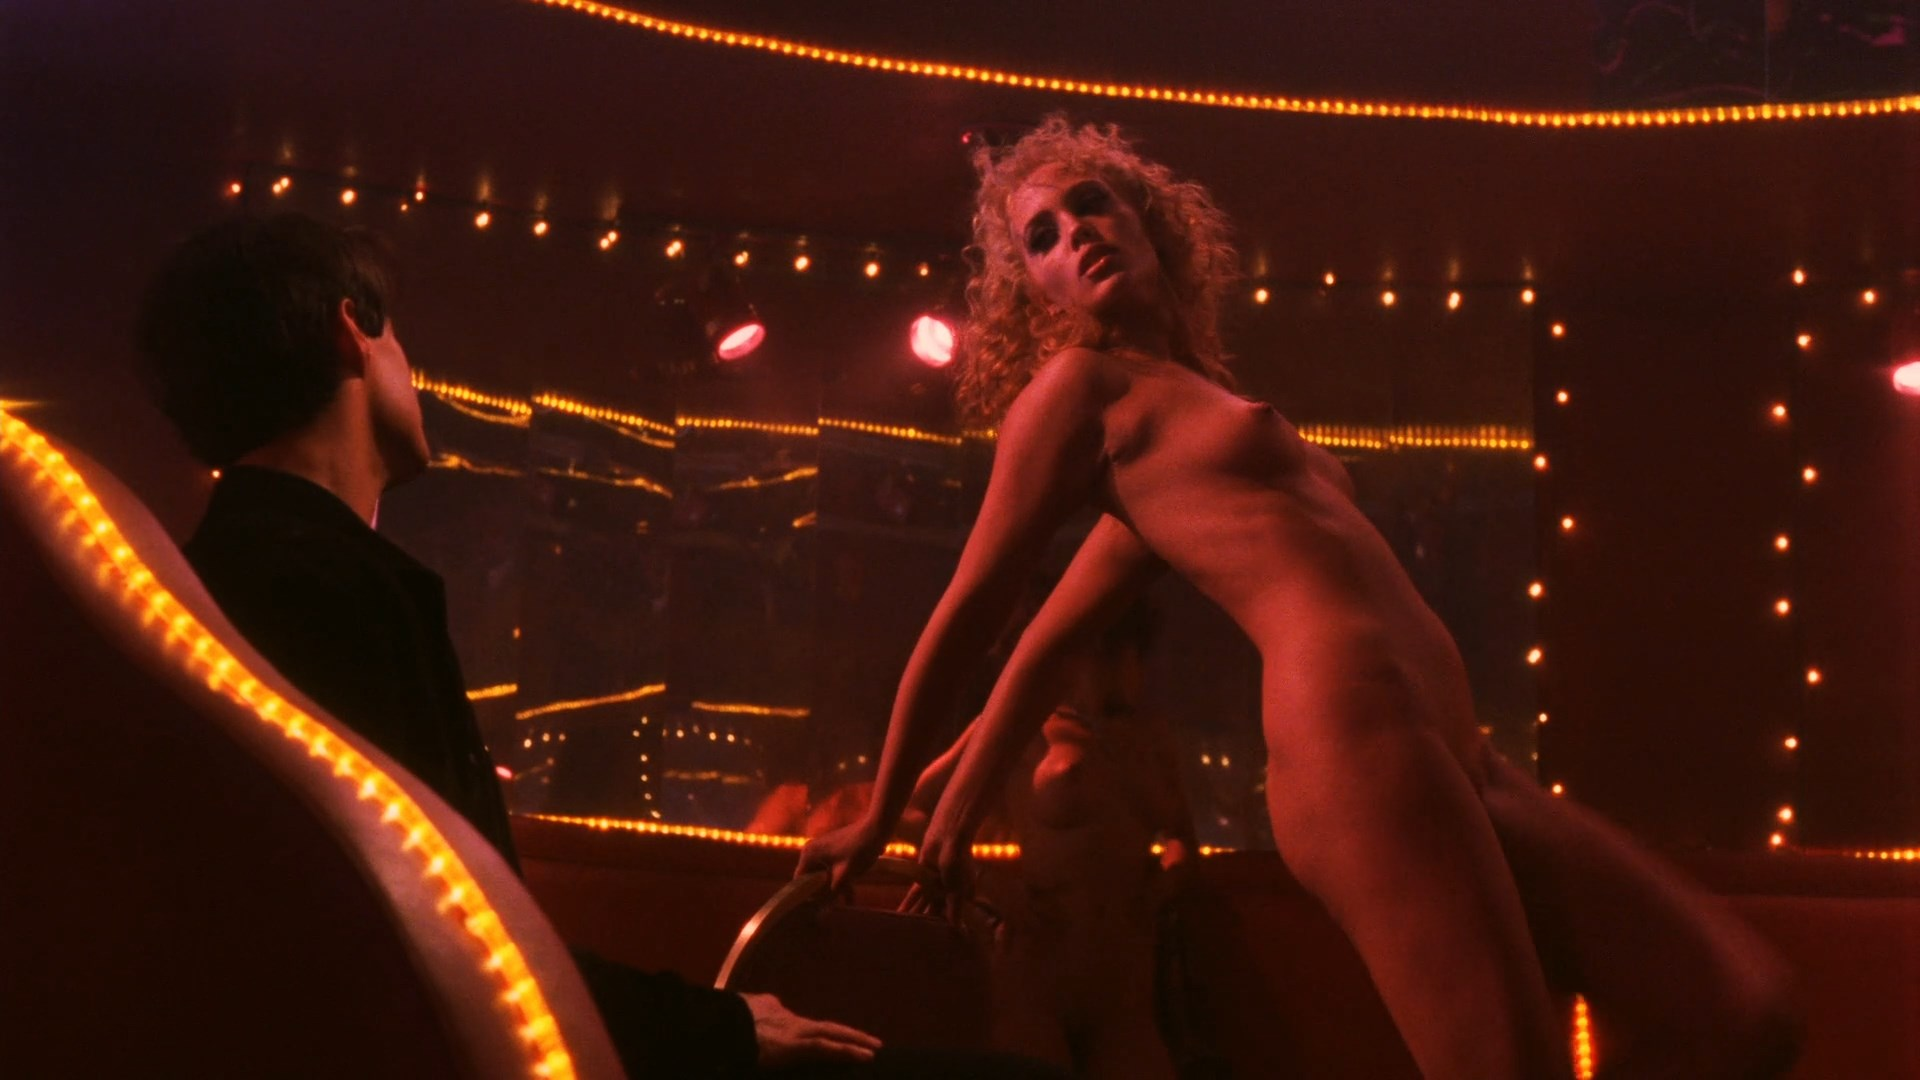 Allison williams nude sex scene in girls series scandalplanetcom